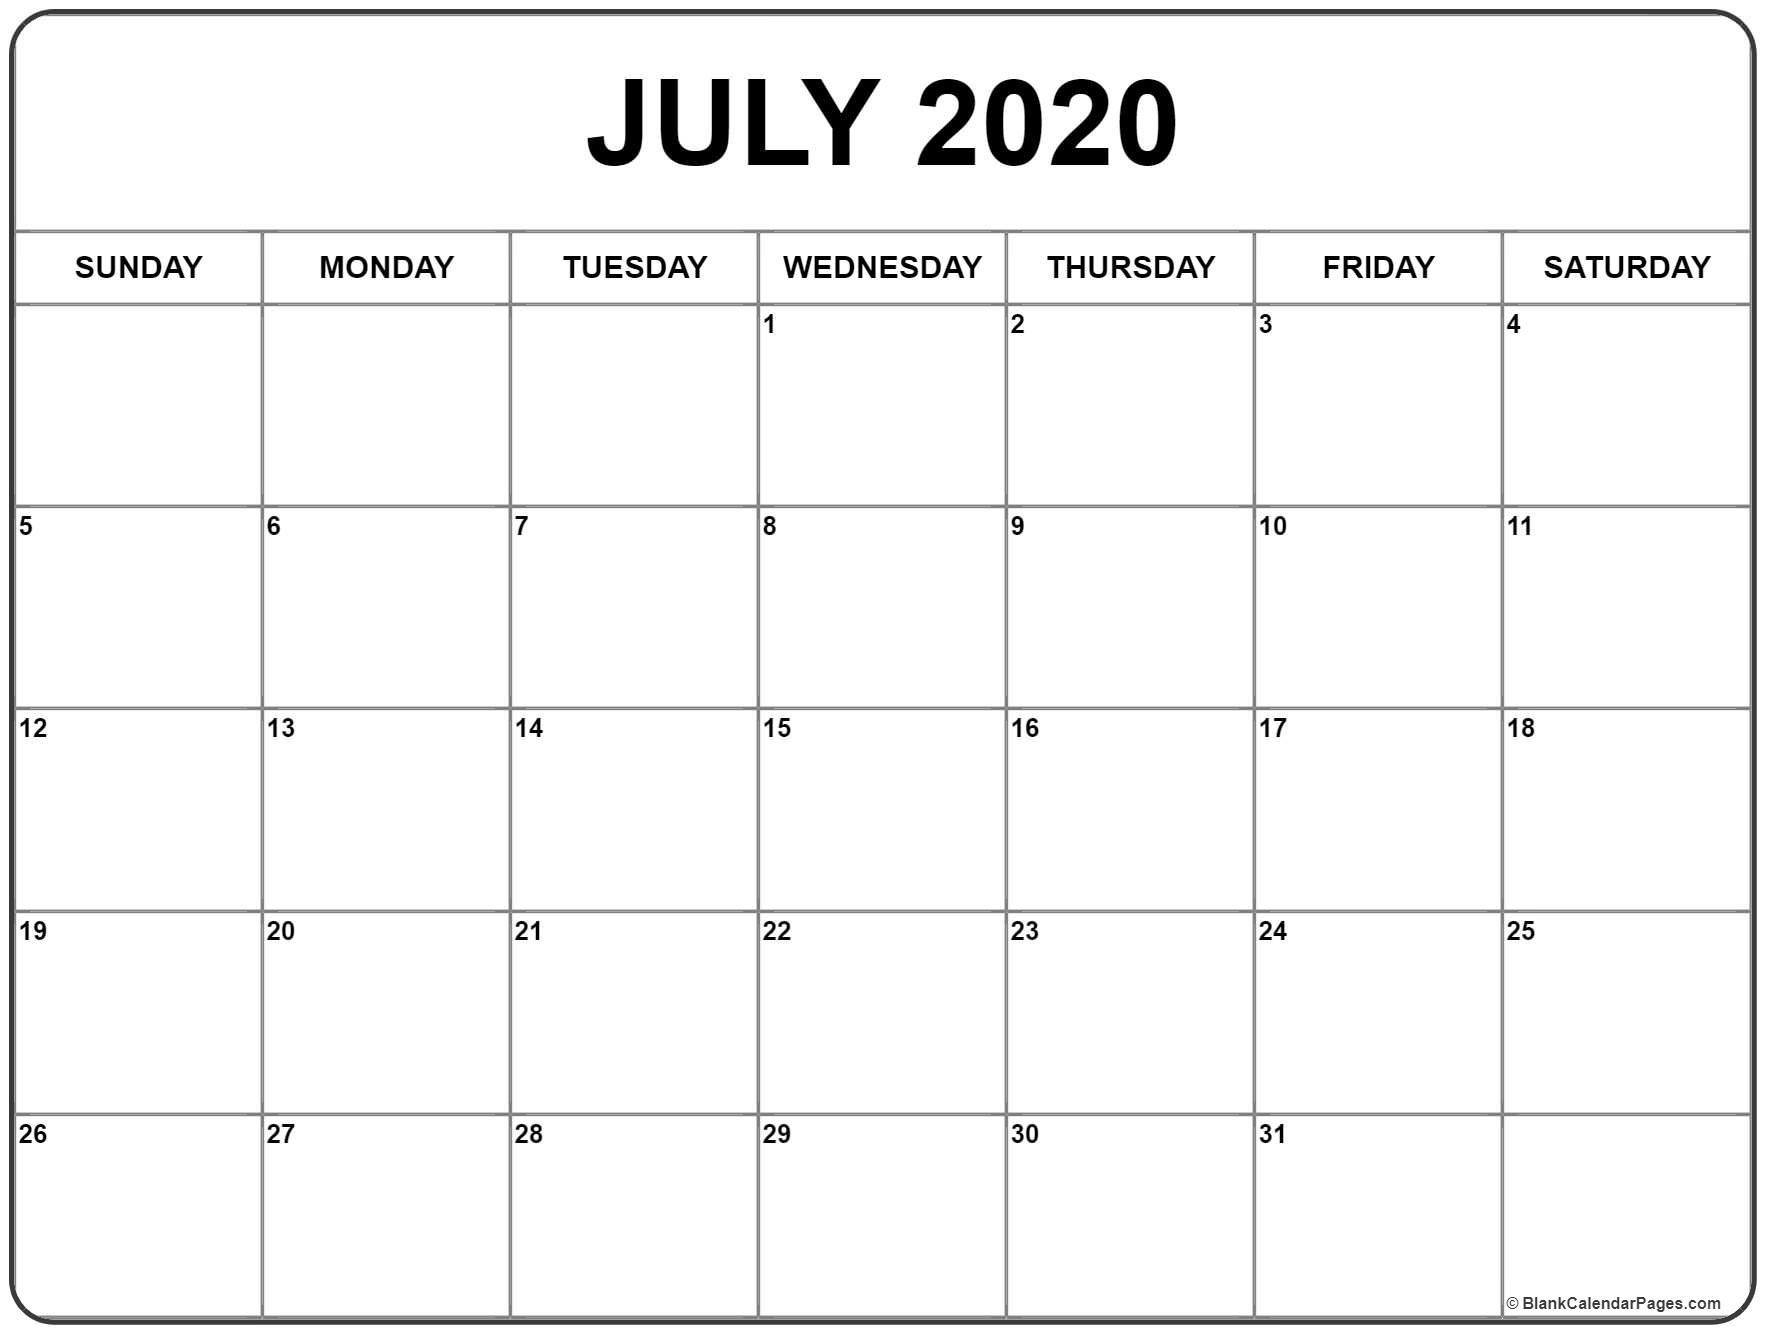 Free July Holidays 2020 Calendar Printable For Usa Uk Canada-Blank Calendar 2020 Printable Uk